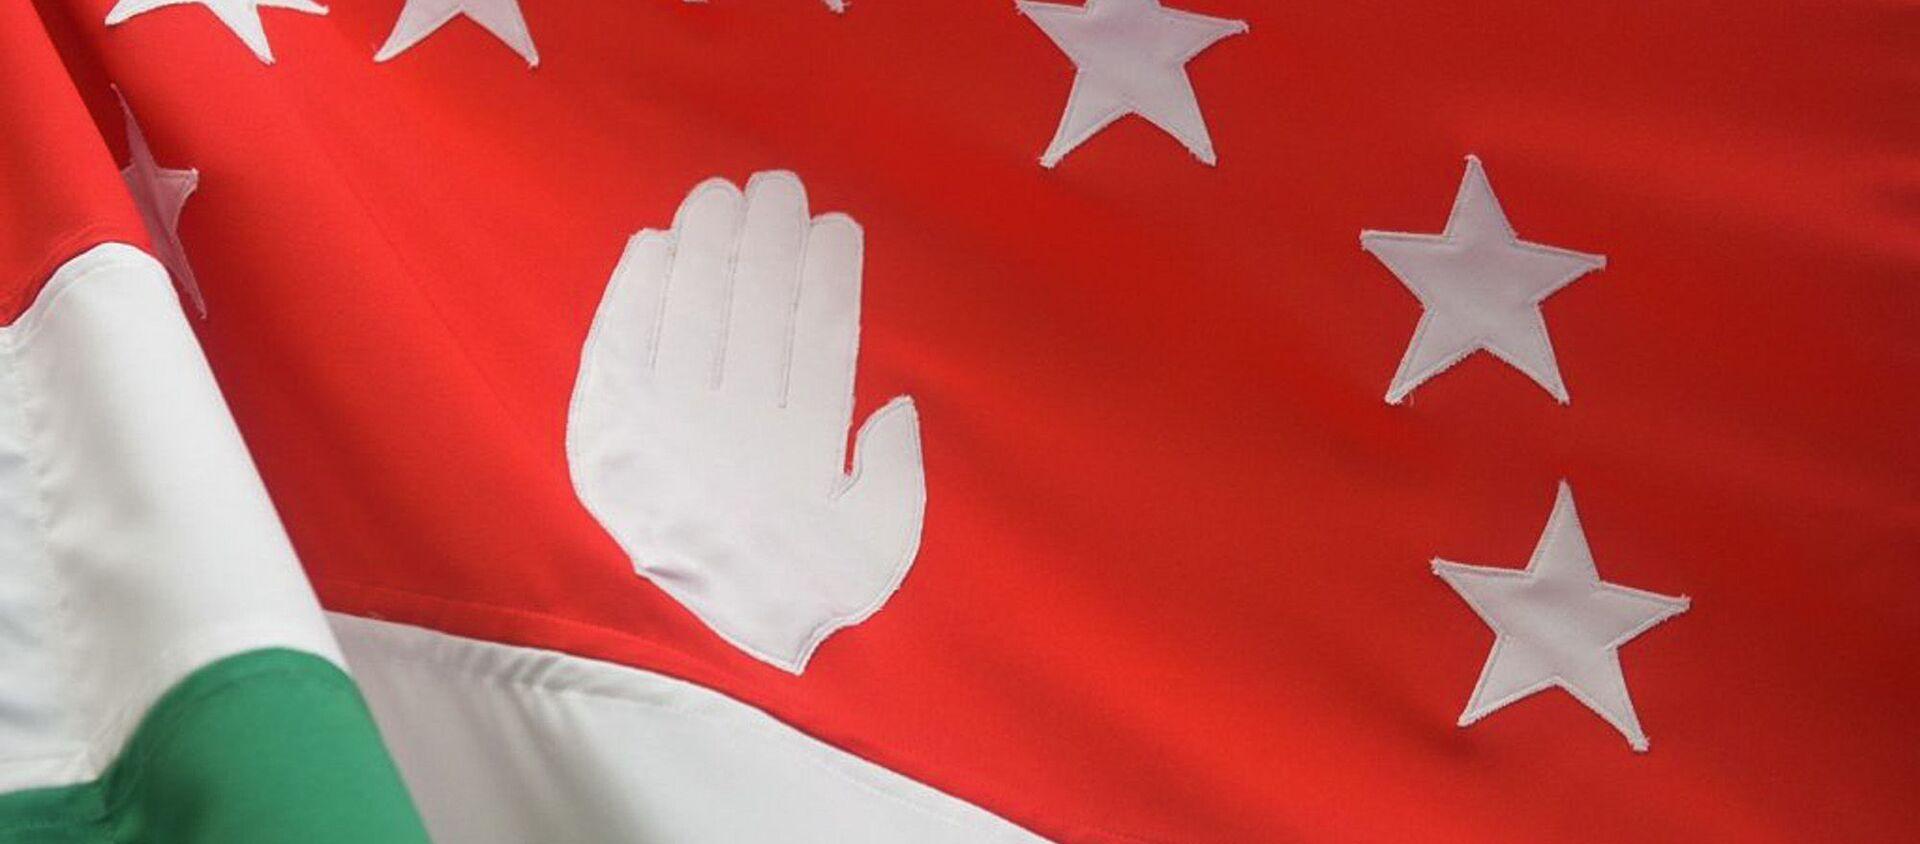 Флаг Абхазии - Sputnik Абхазия, 1920, 03.02.2020